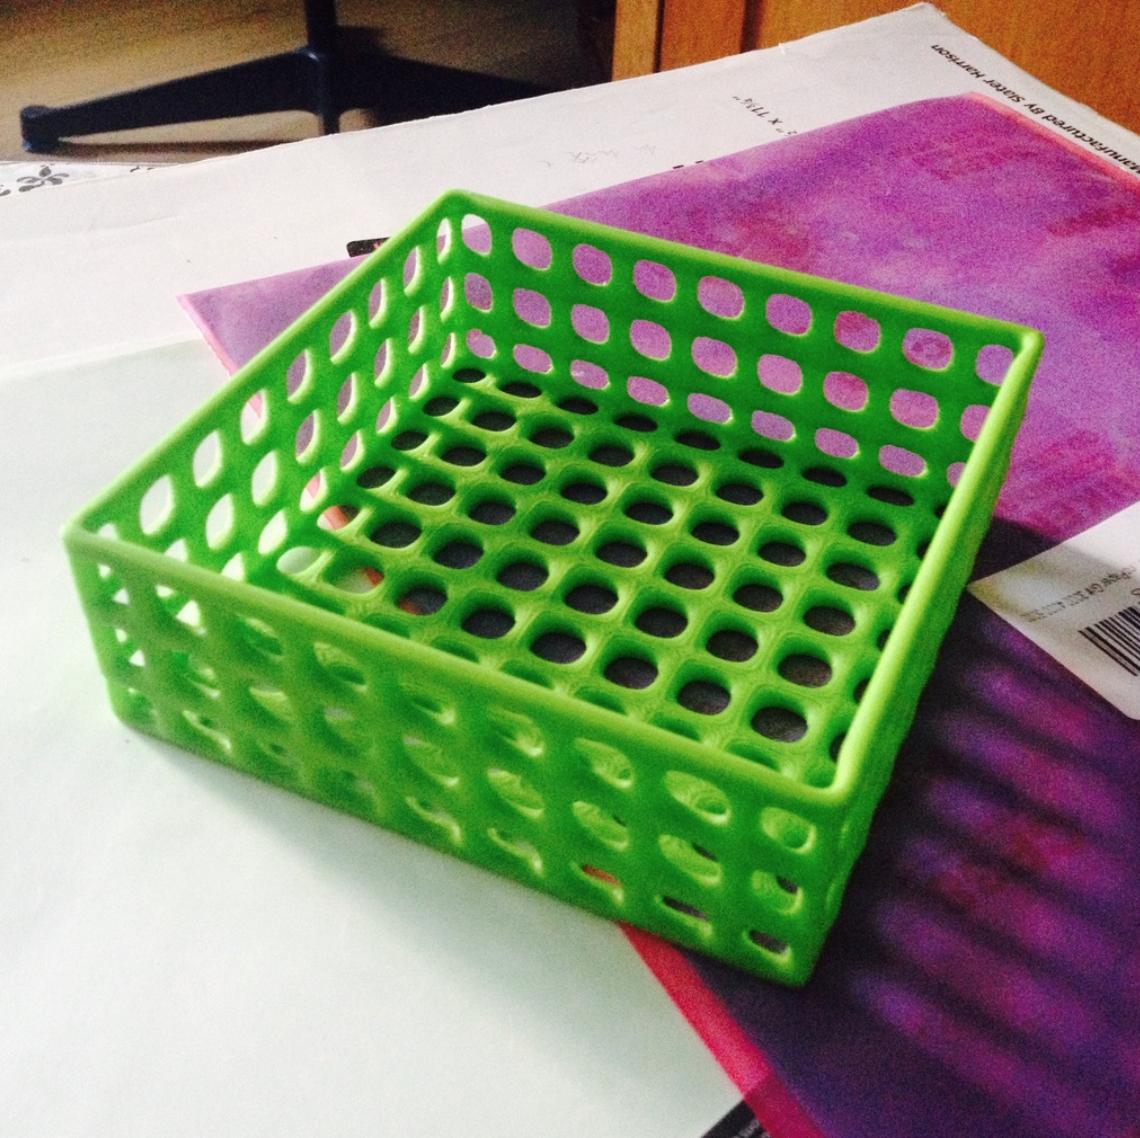 Capture d'écran 2017-10-24 à 14.13.52.png Download free STL file Square wire basket tray • 3D printing model, tone001